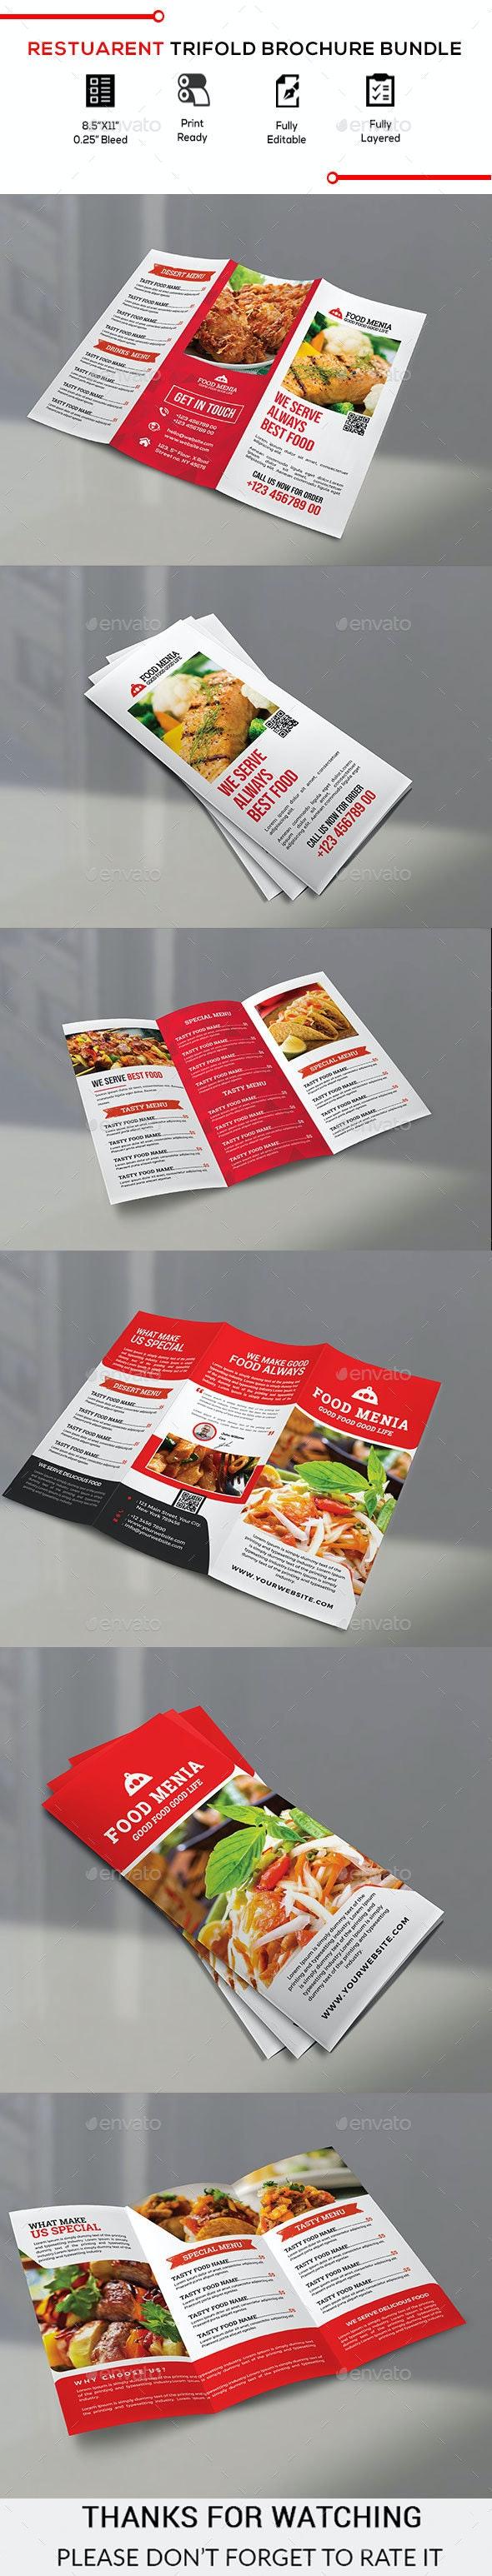 Restaurant Trifold Brochure Bundle - Brochures Print Templates